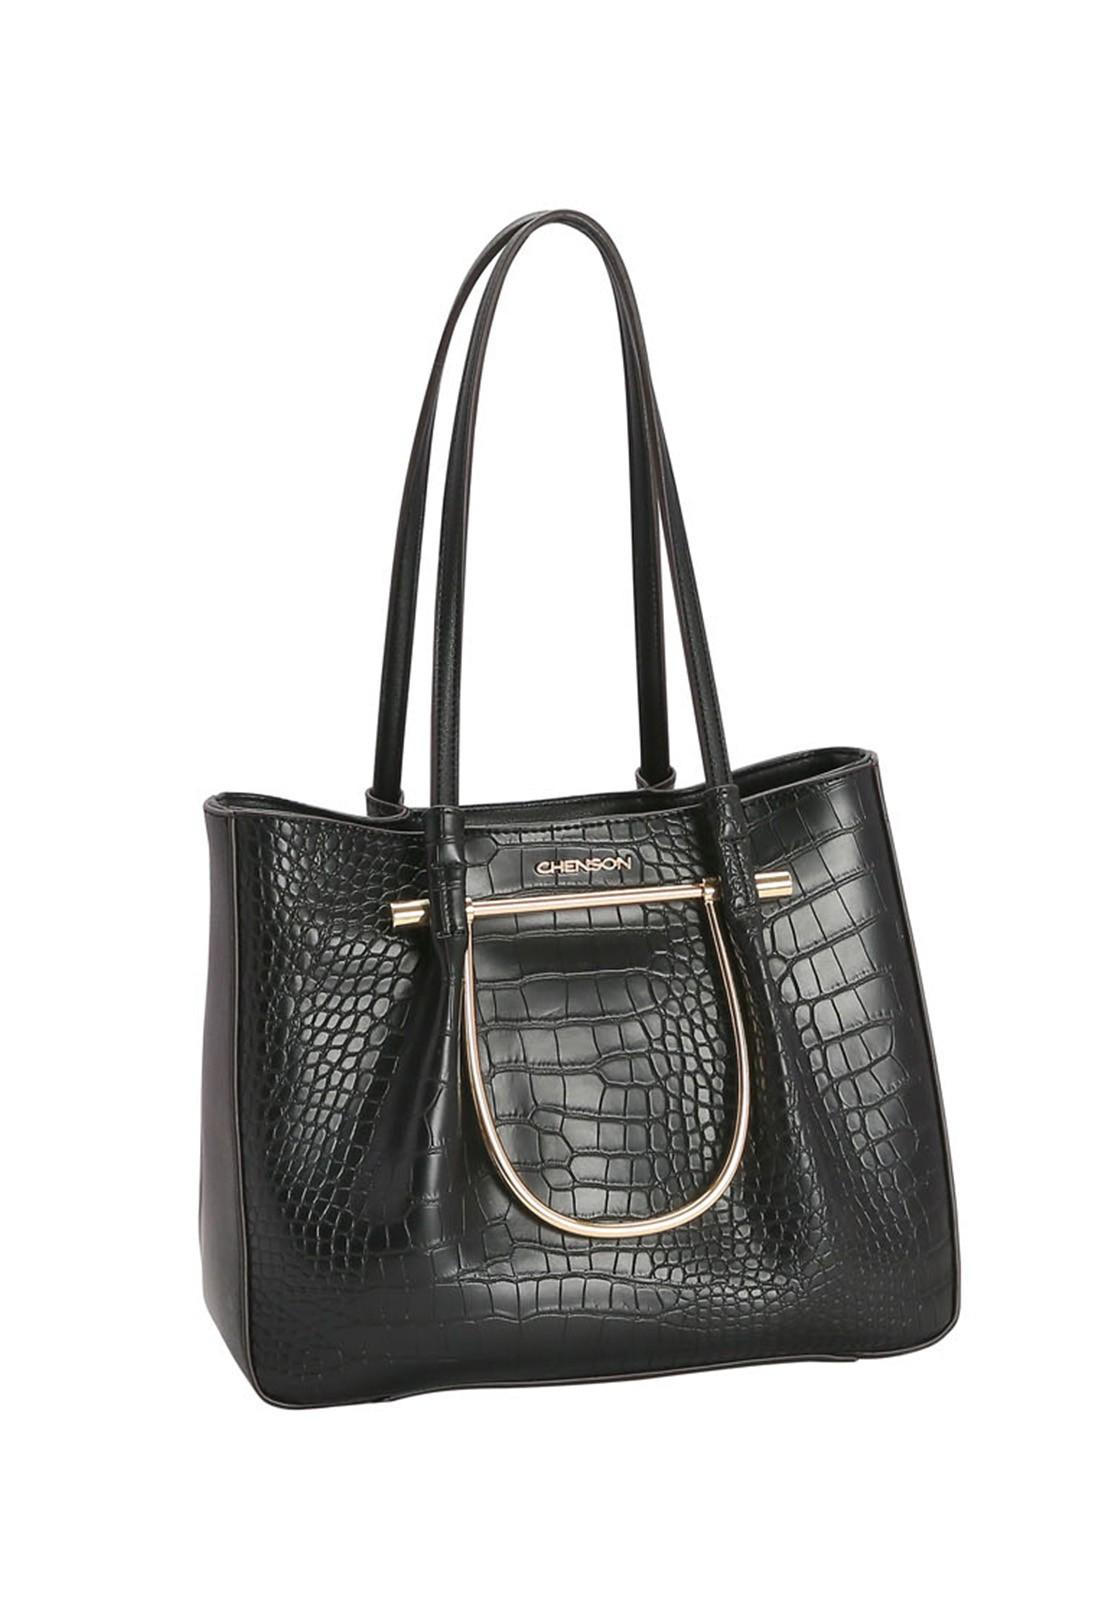 Bolsa Feminina Chenson Elegance de Ombro 3483209